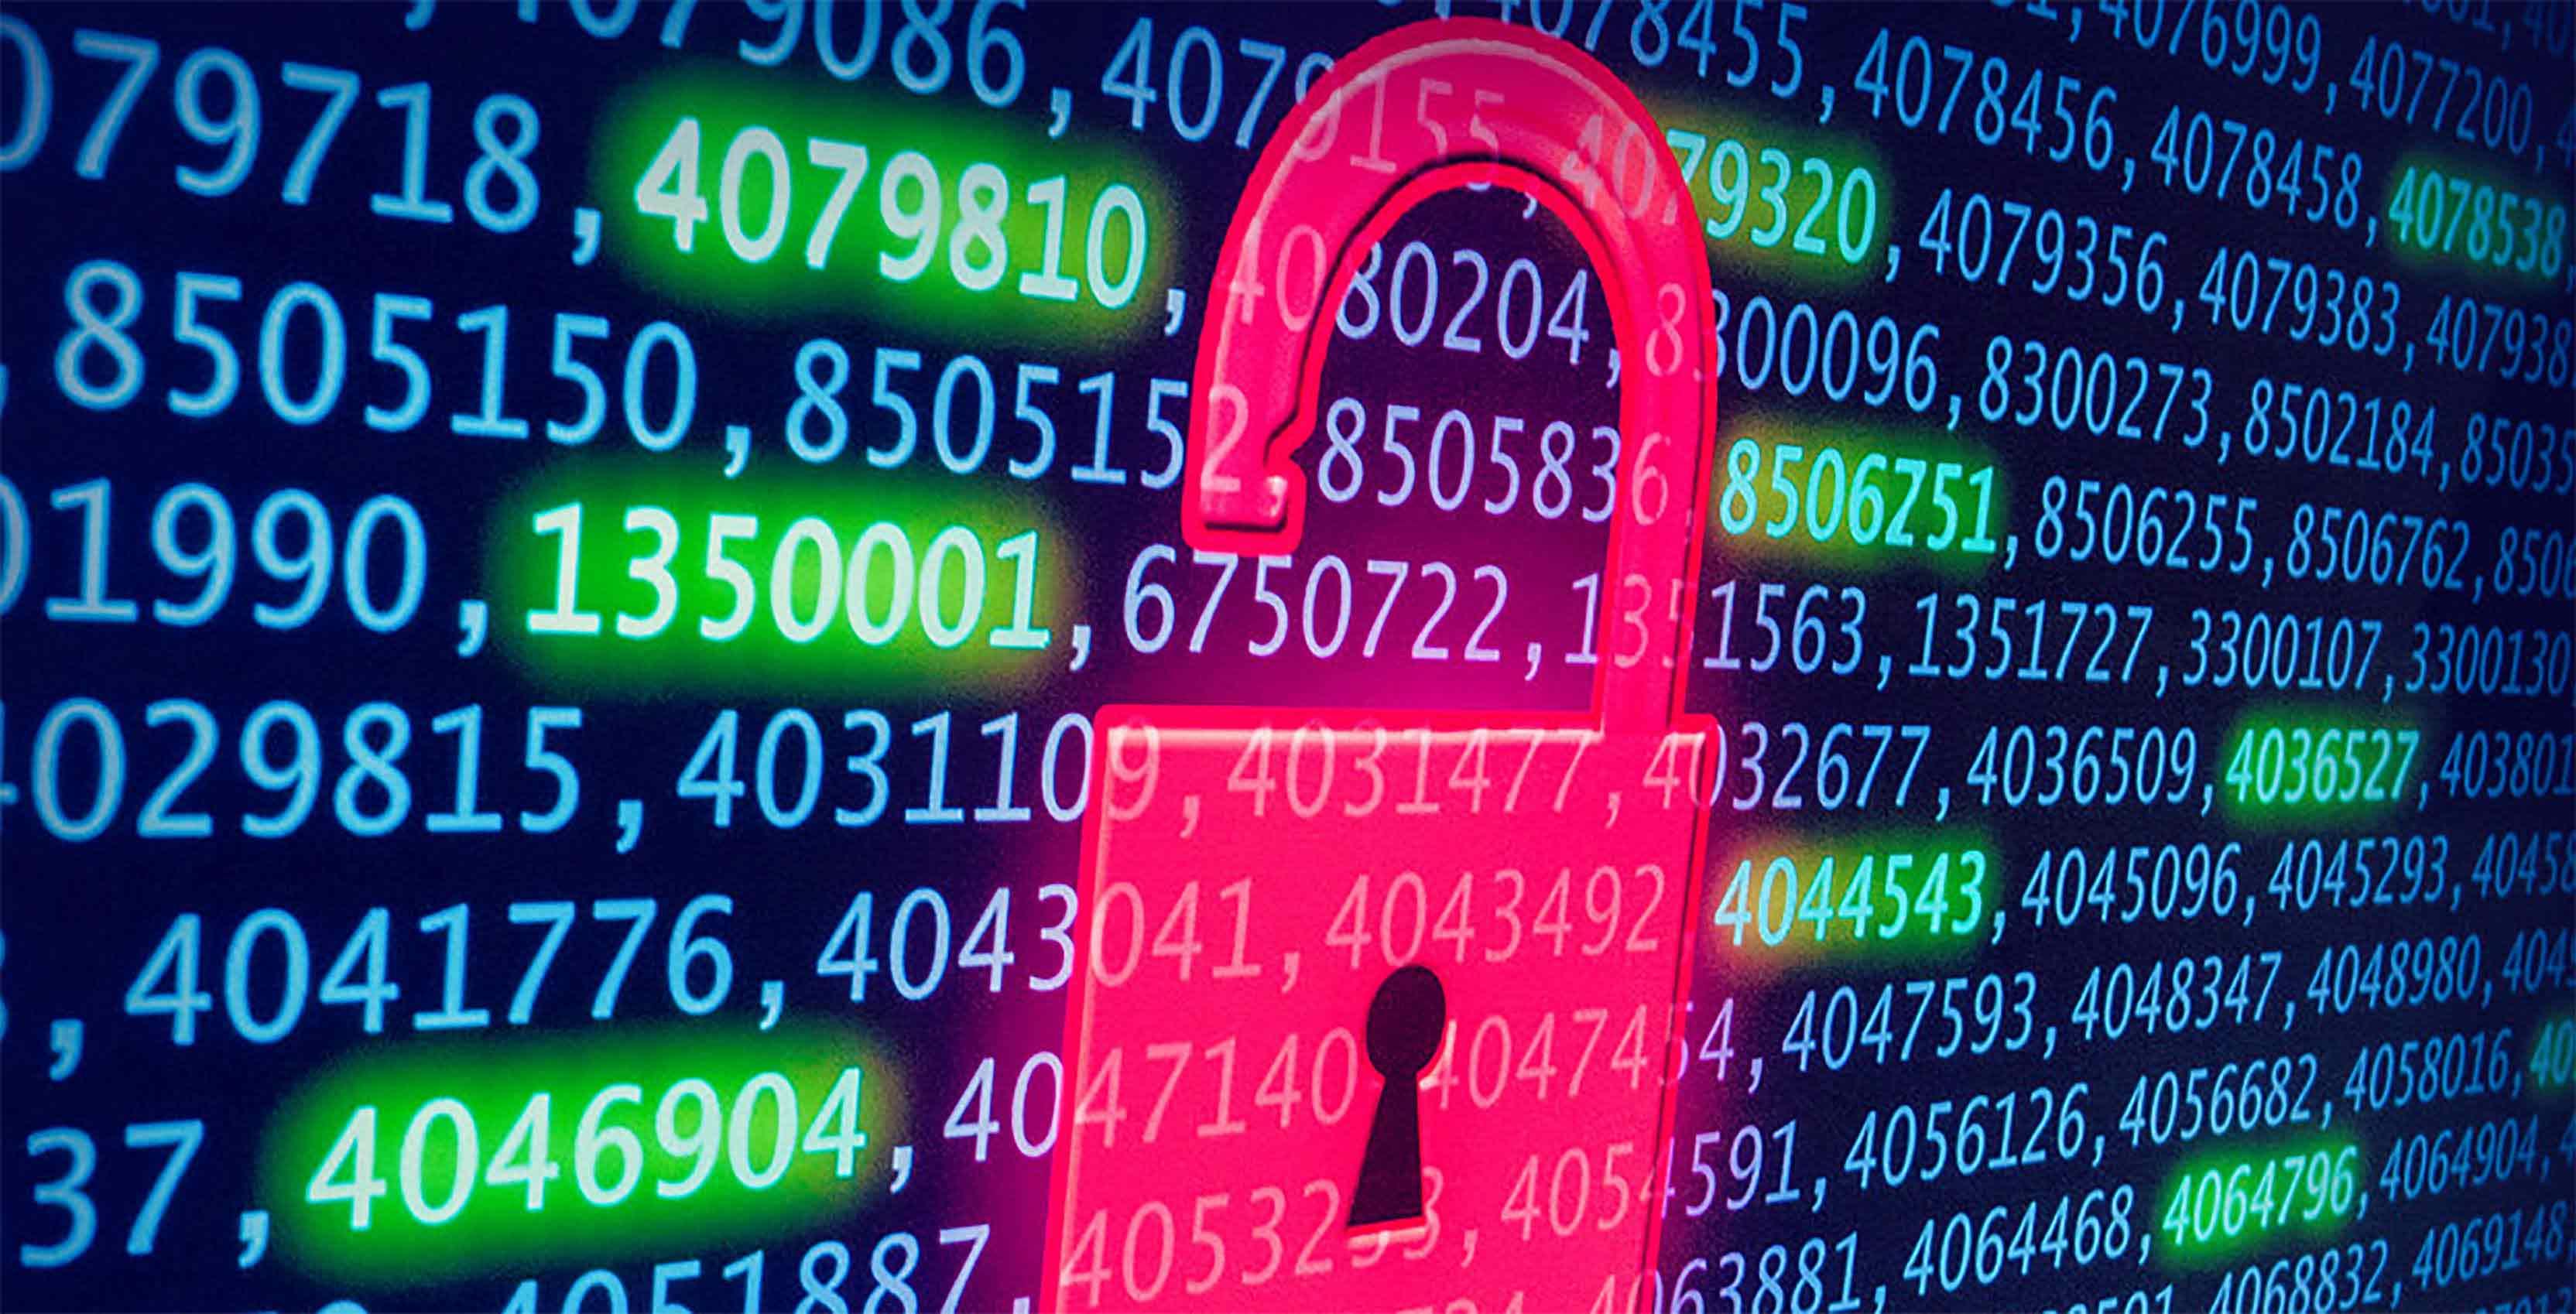 data breaches in canada